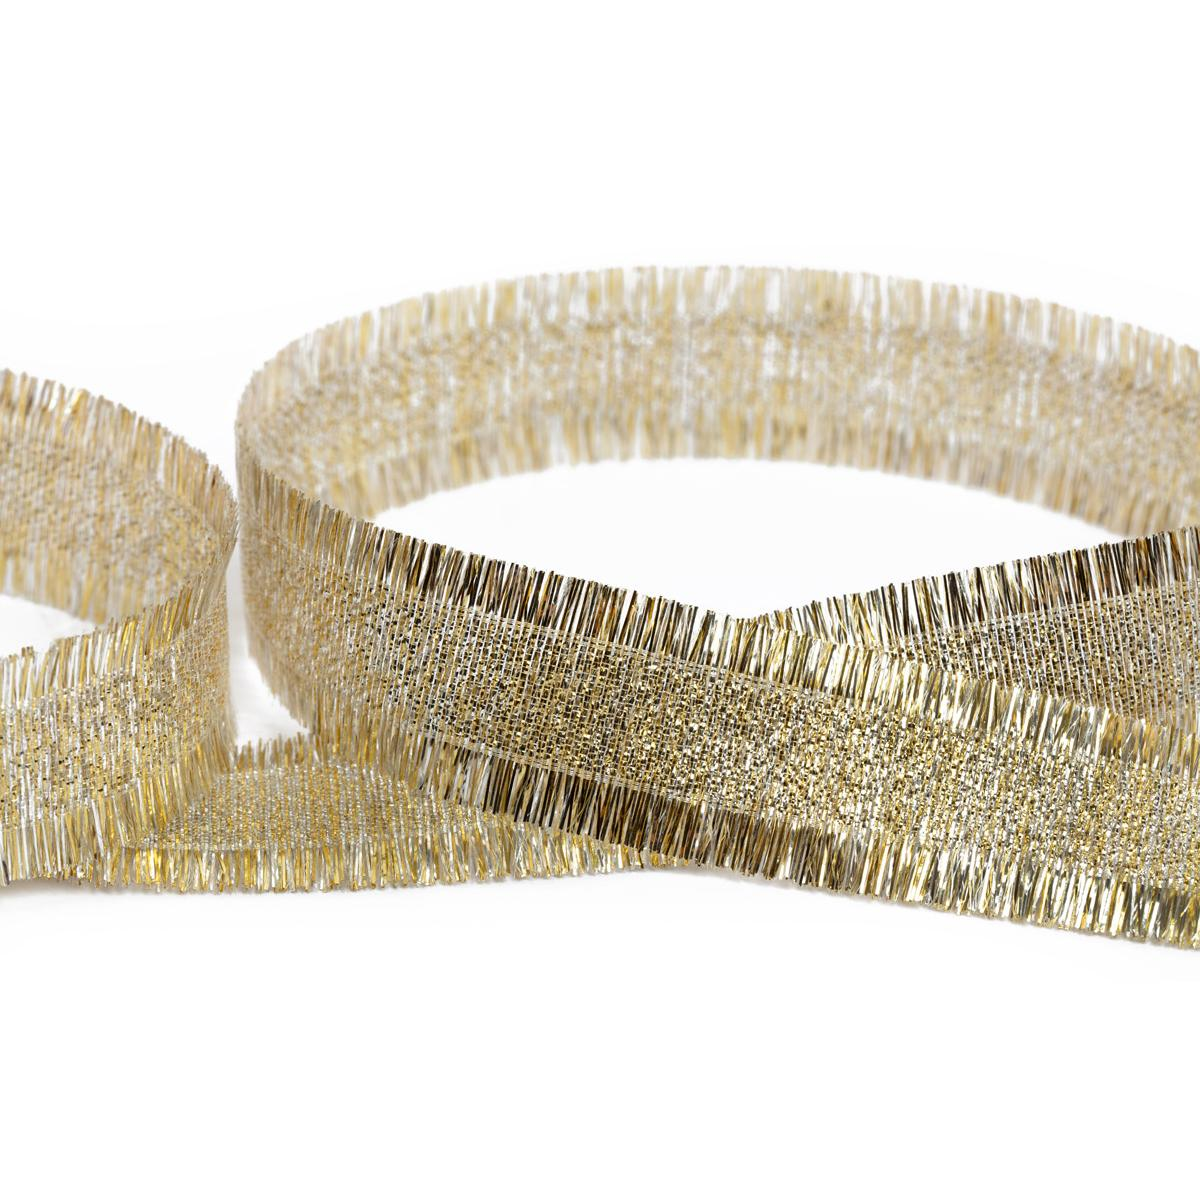 Тесьма металлизированная с бахромой 20мм 33м MRBH-20 под золото/под серебро